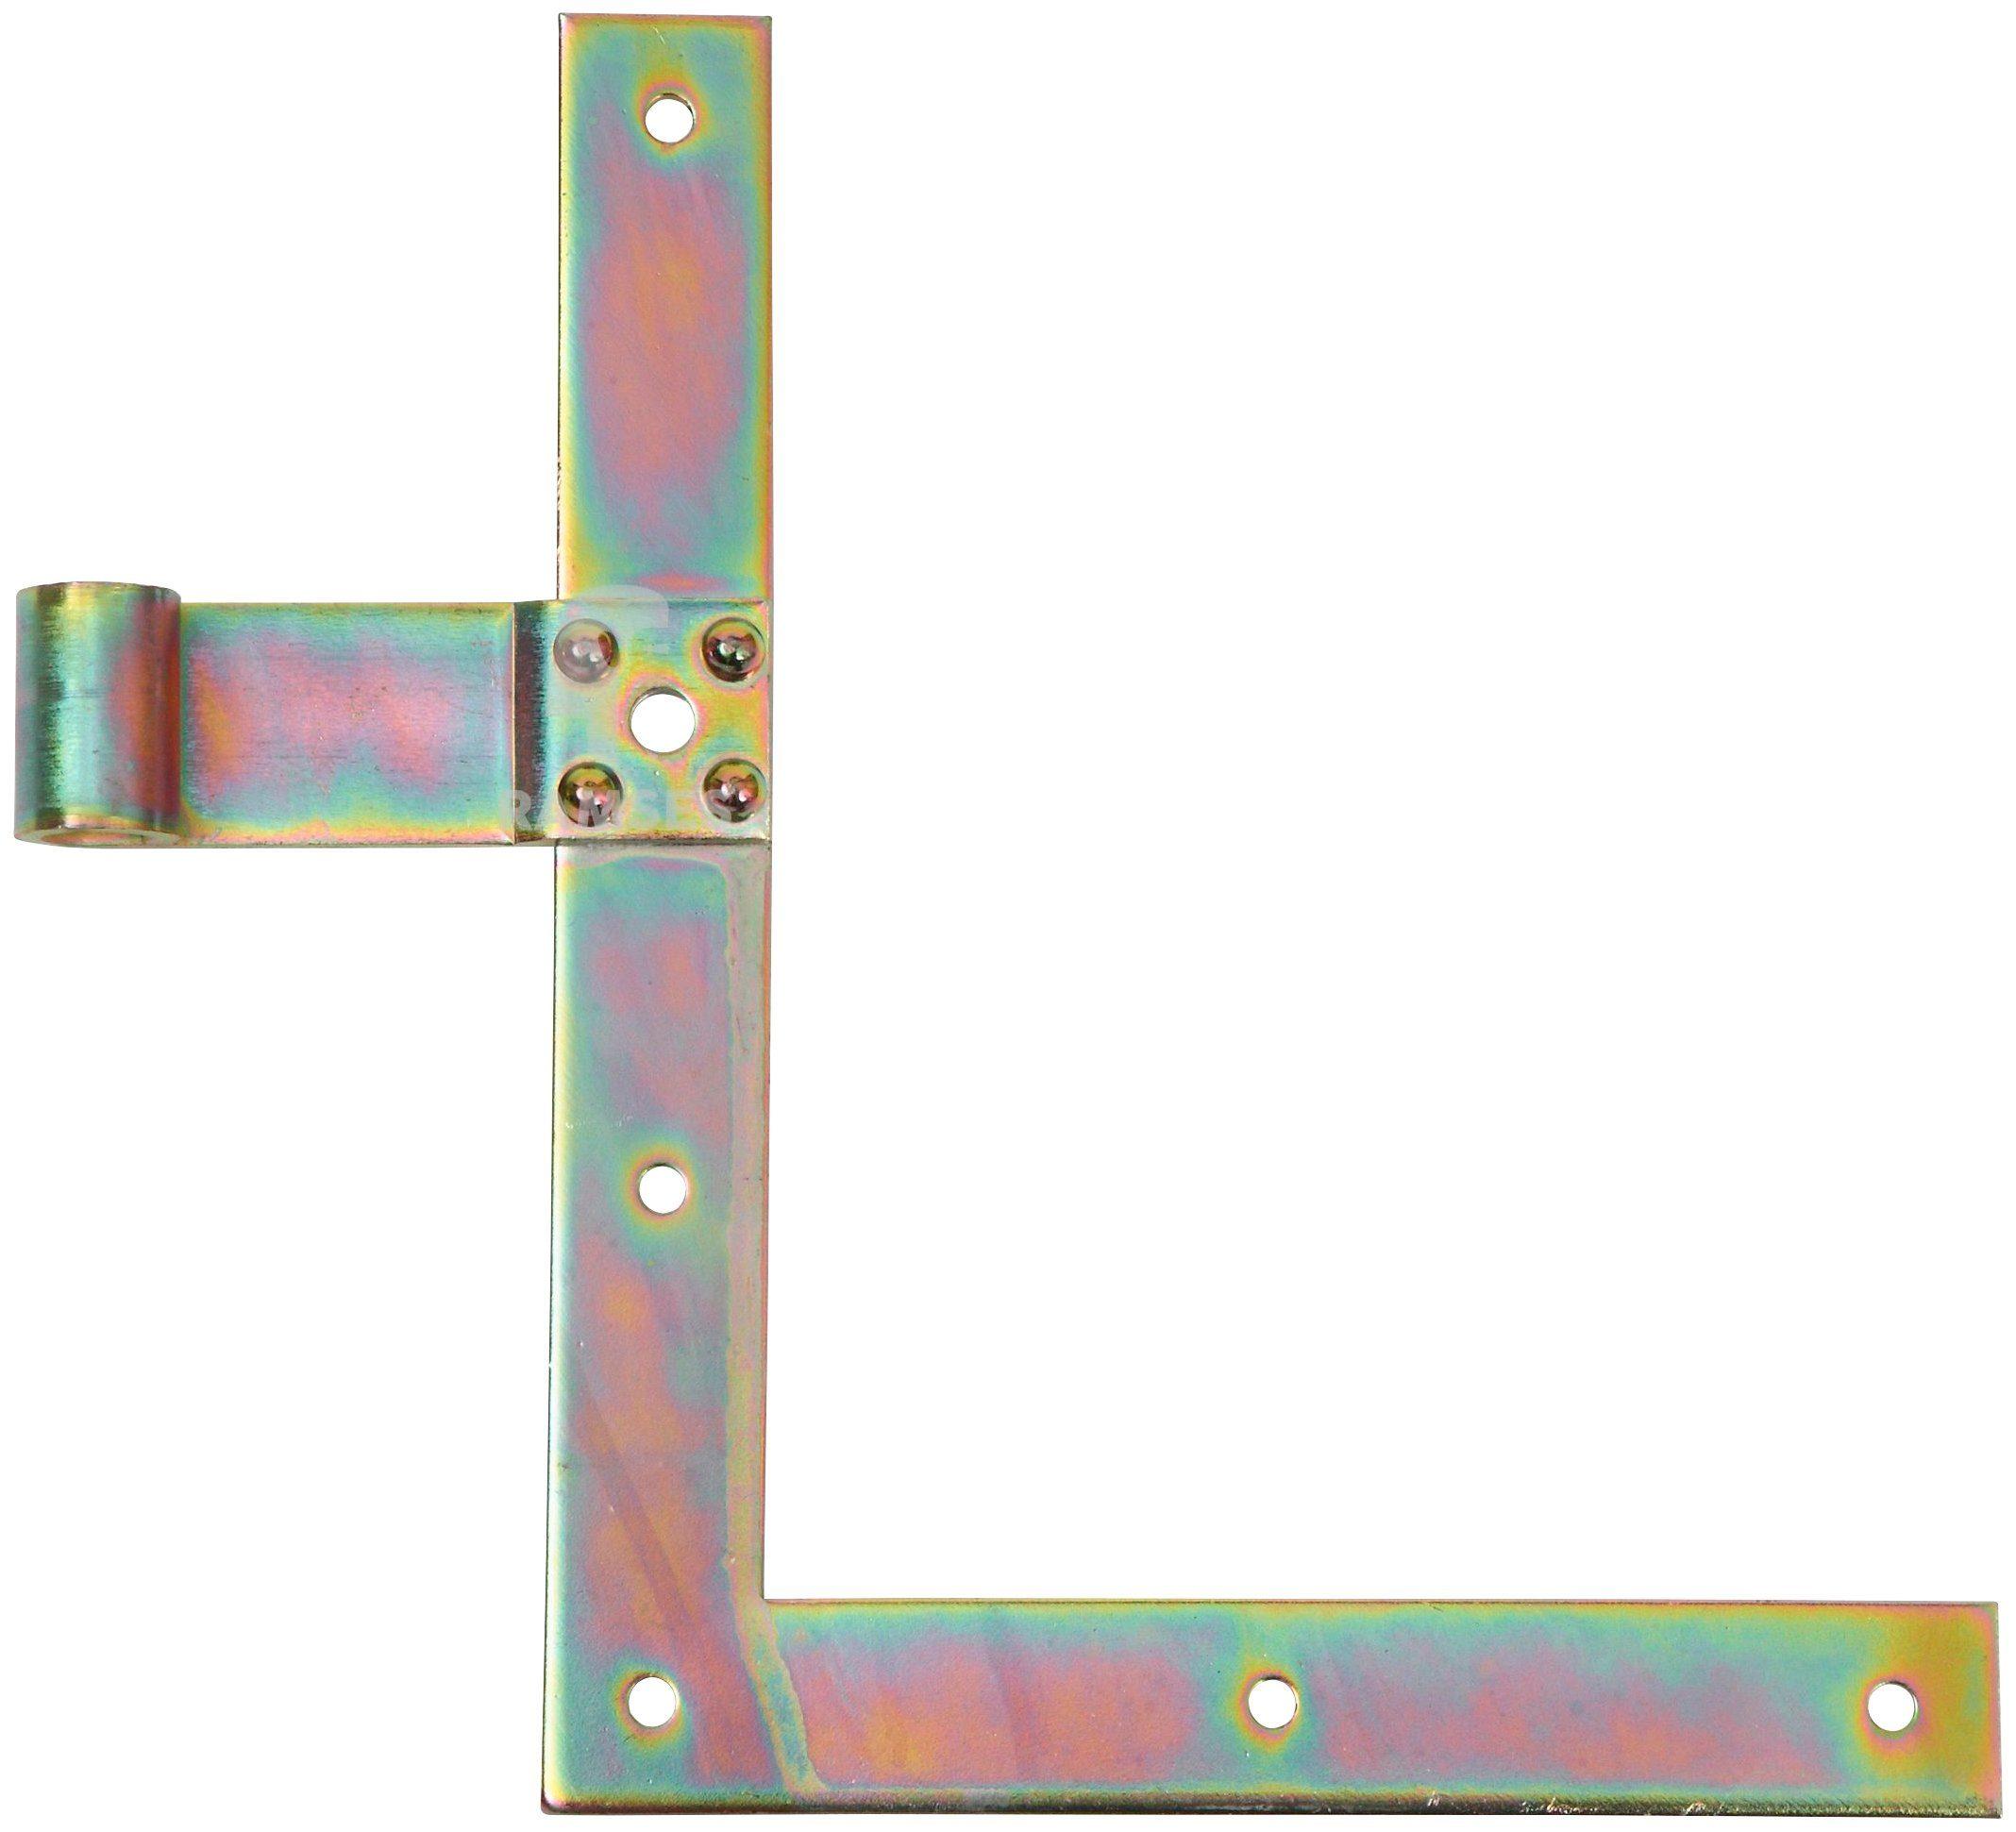 RAMSES Fensterladen-Winkelband , rechts unten 200 mm für Dorn Ø 13 mm Stahl verzinkt